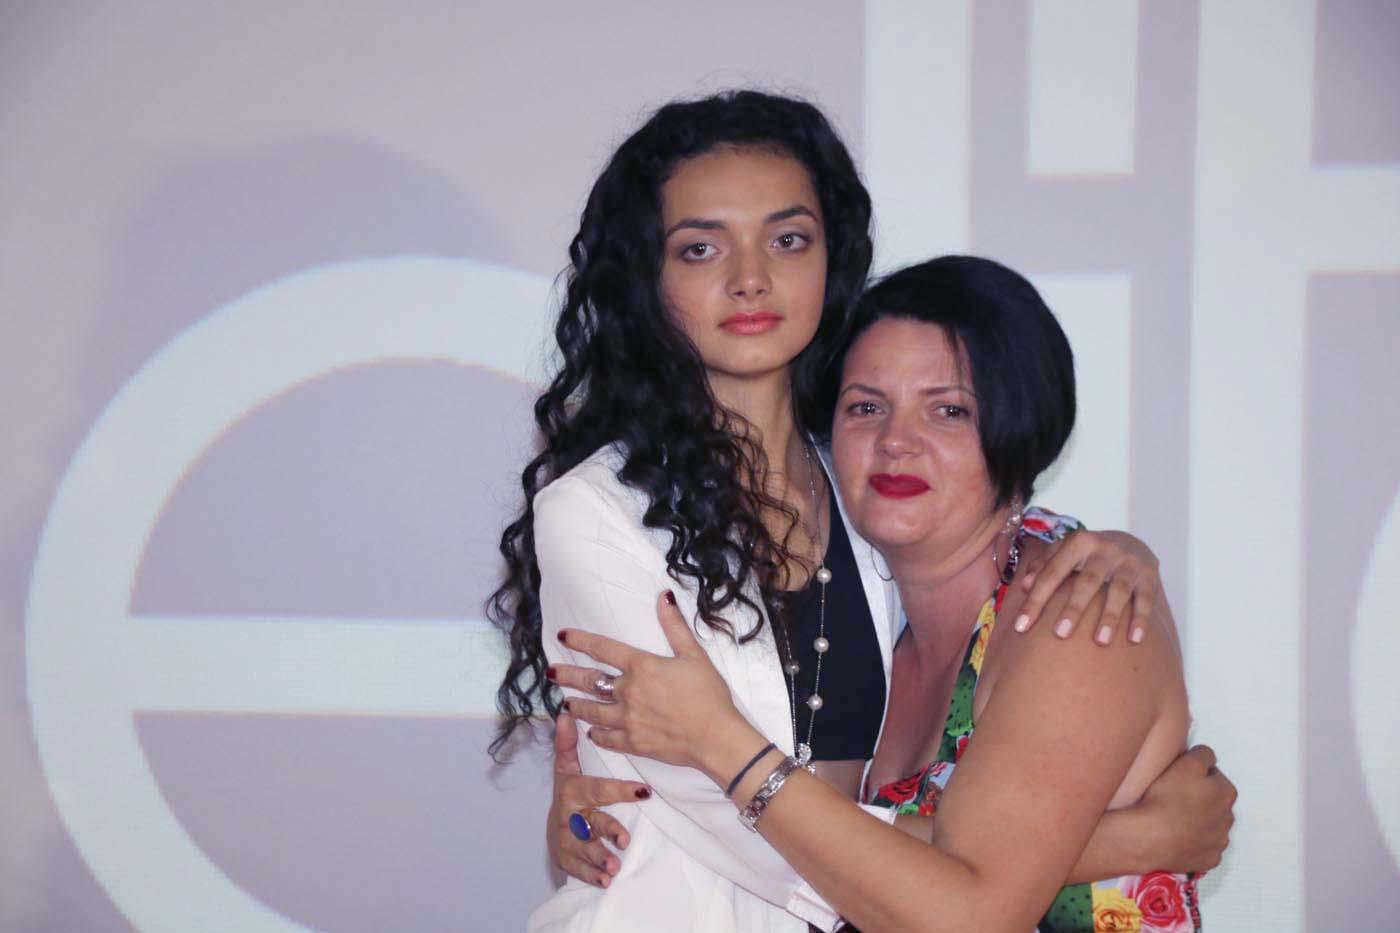 Kiana et sa maman Sandrine